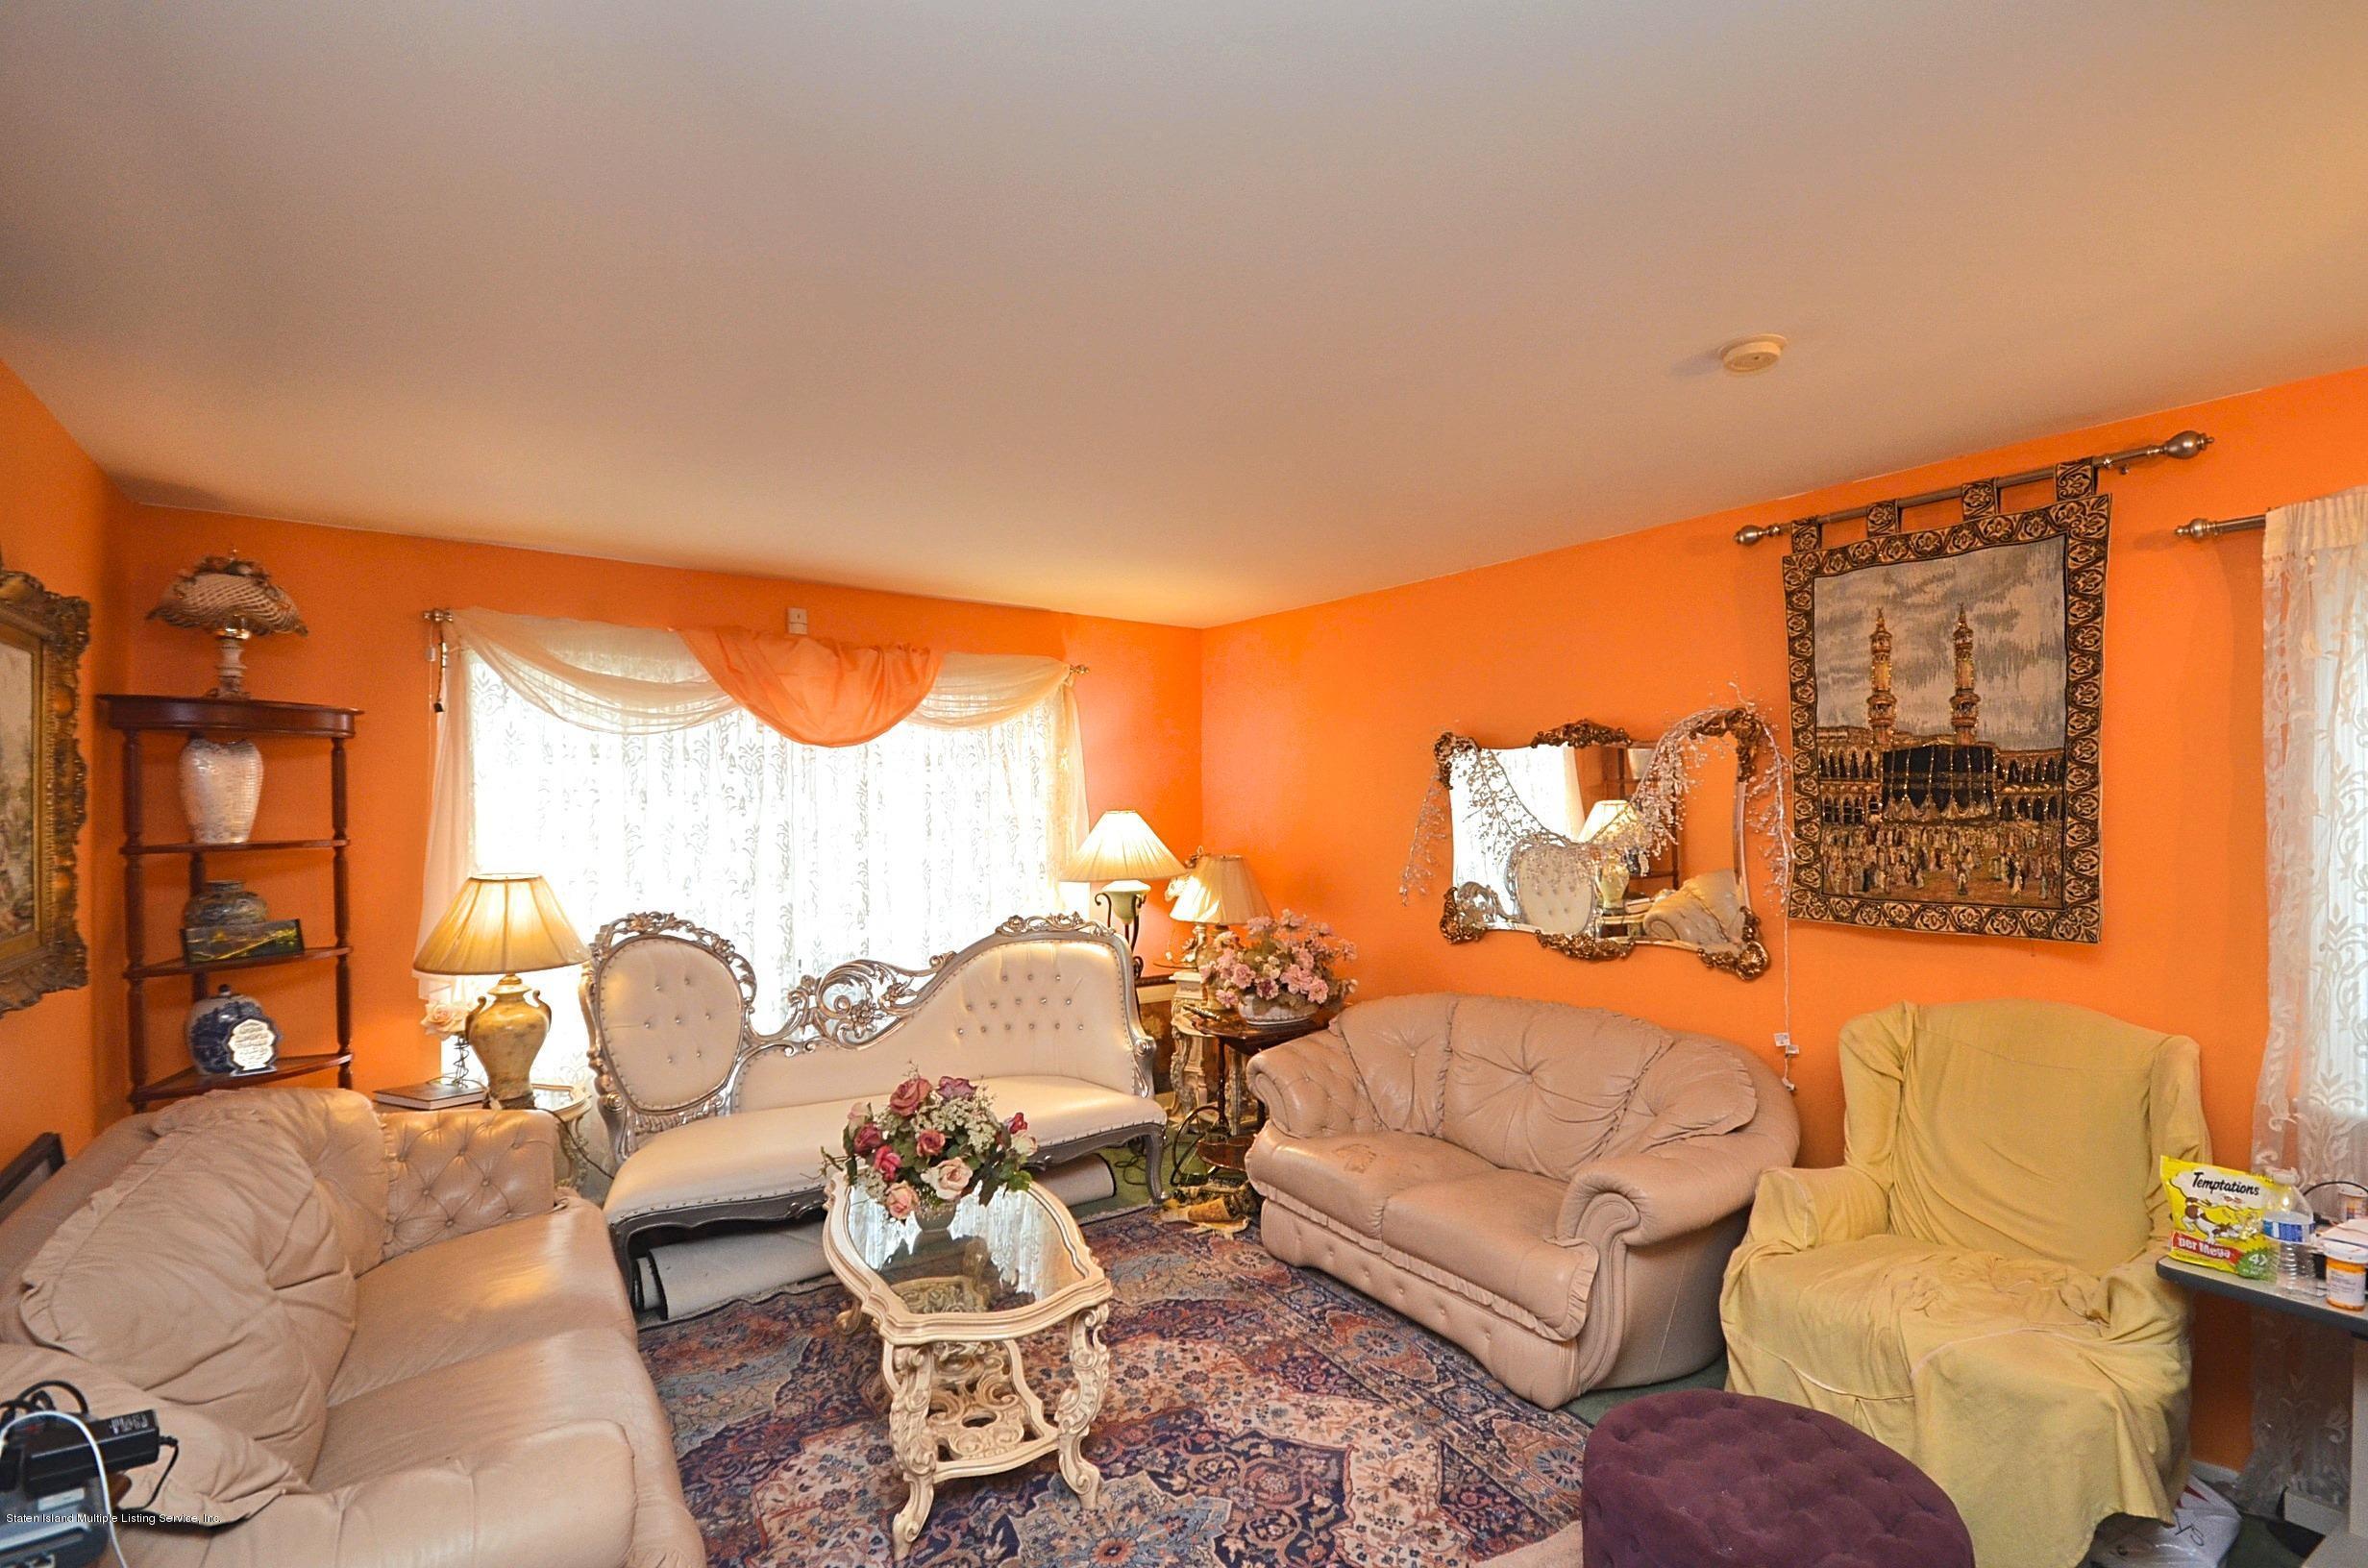 Single Family - Attached 200 Kenilworth Avenue  Staten Island, NY 10312, MLS-1124636-3